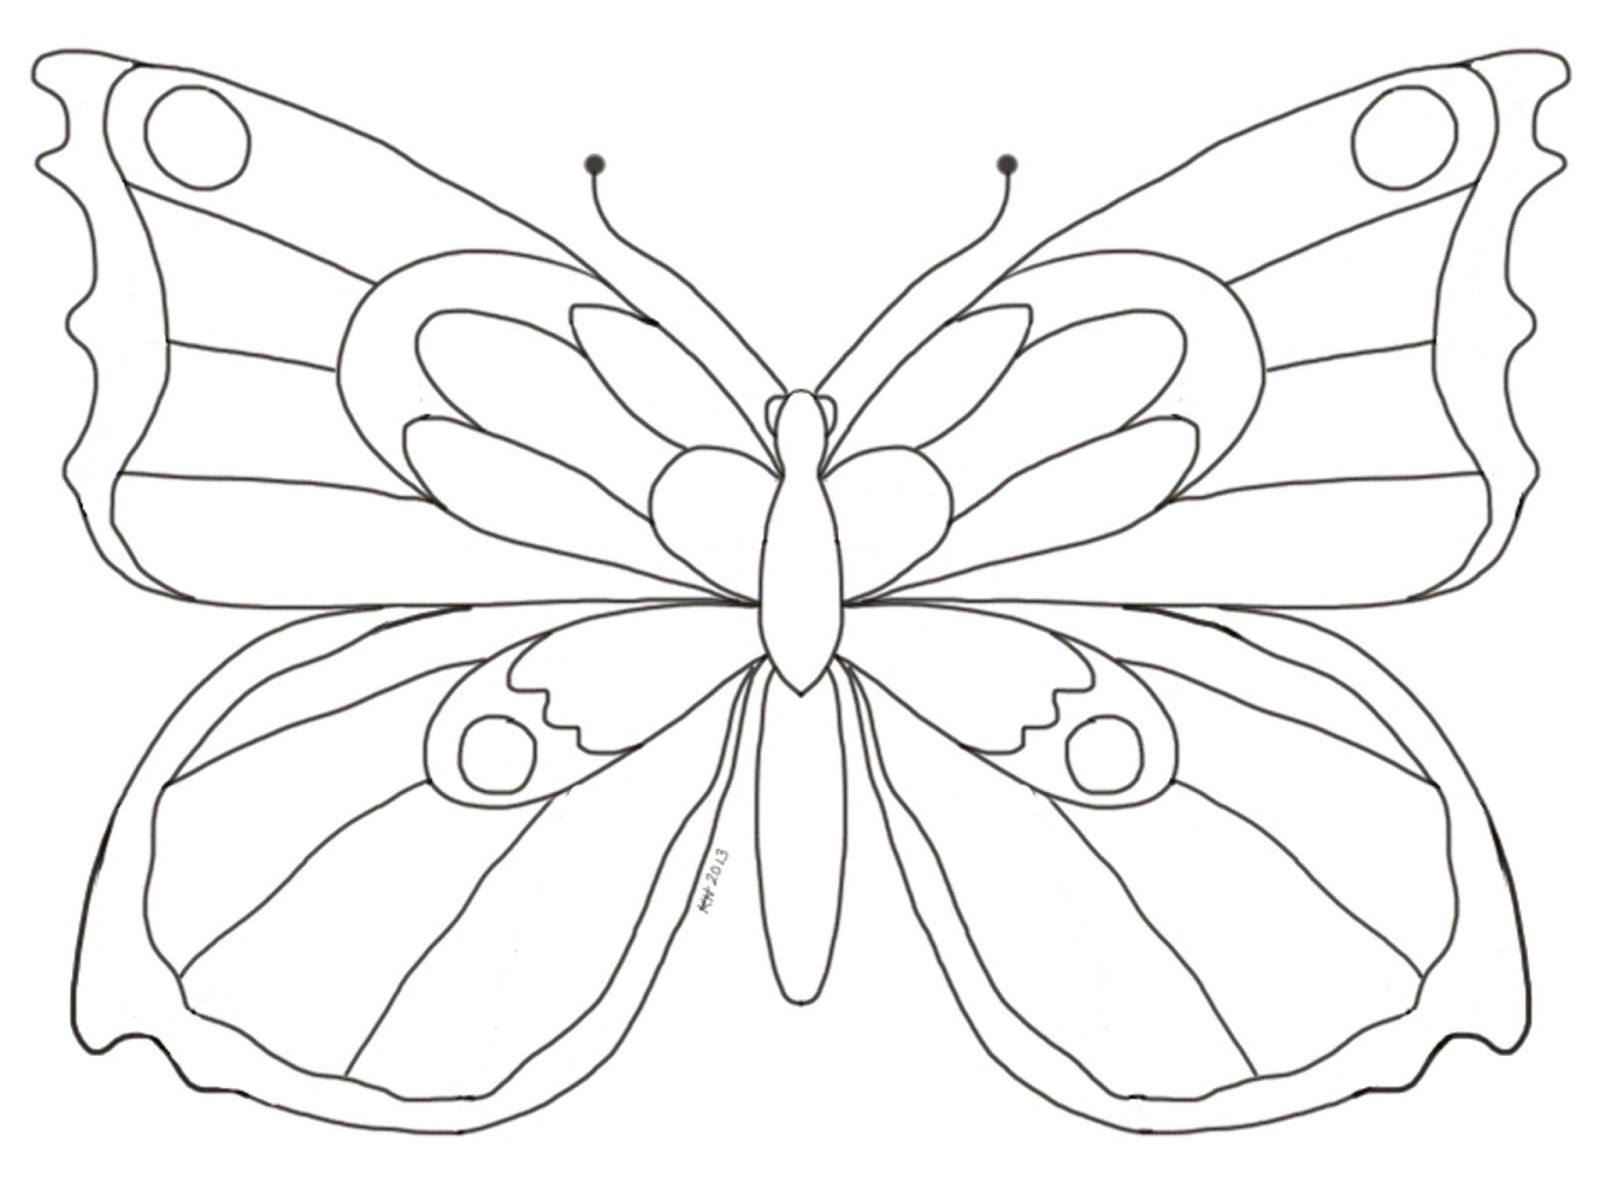 Ausmalbilder Kostenlos Schmetterling : Oak Pond Creations Sketchbook News Going To Alaska And A Free Digi